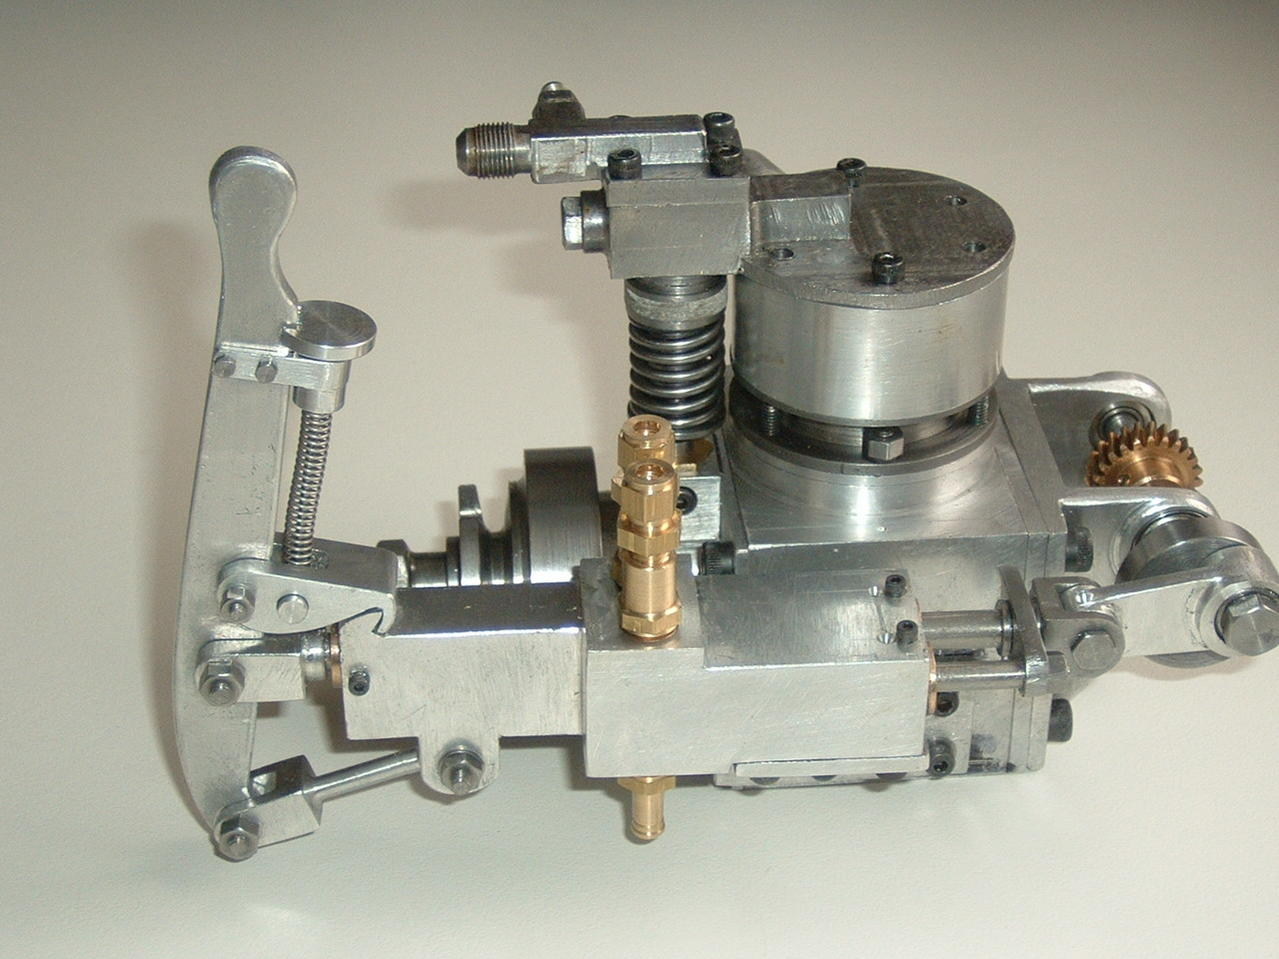 е глухарев пуврд двигатель схема